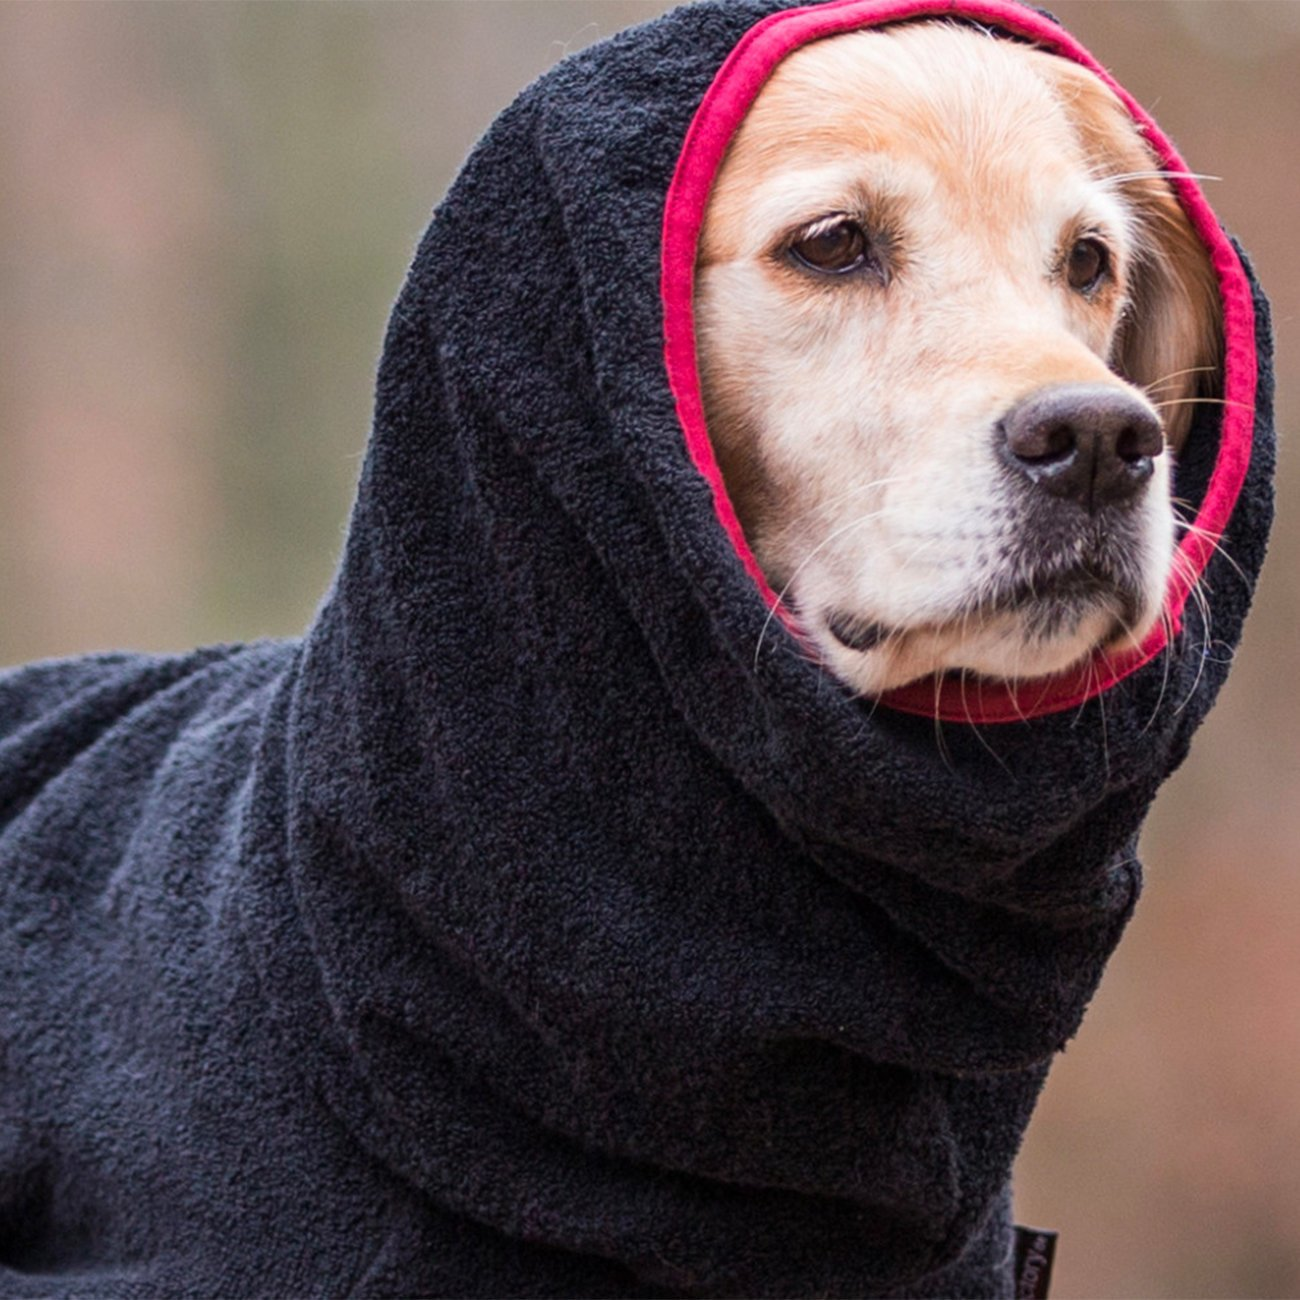 fit4dogs Trockenmantel Hund Dryup Cape, Bild 8